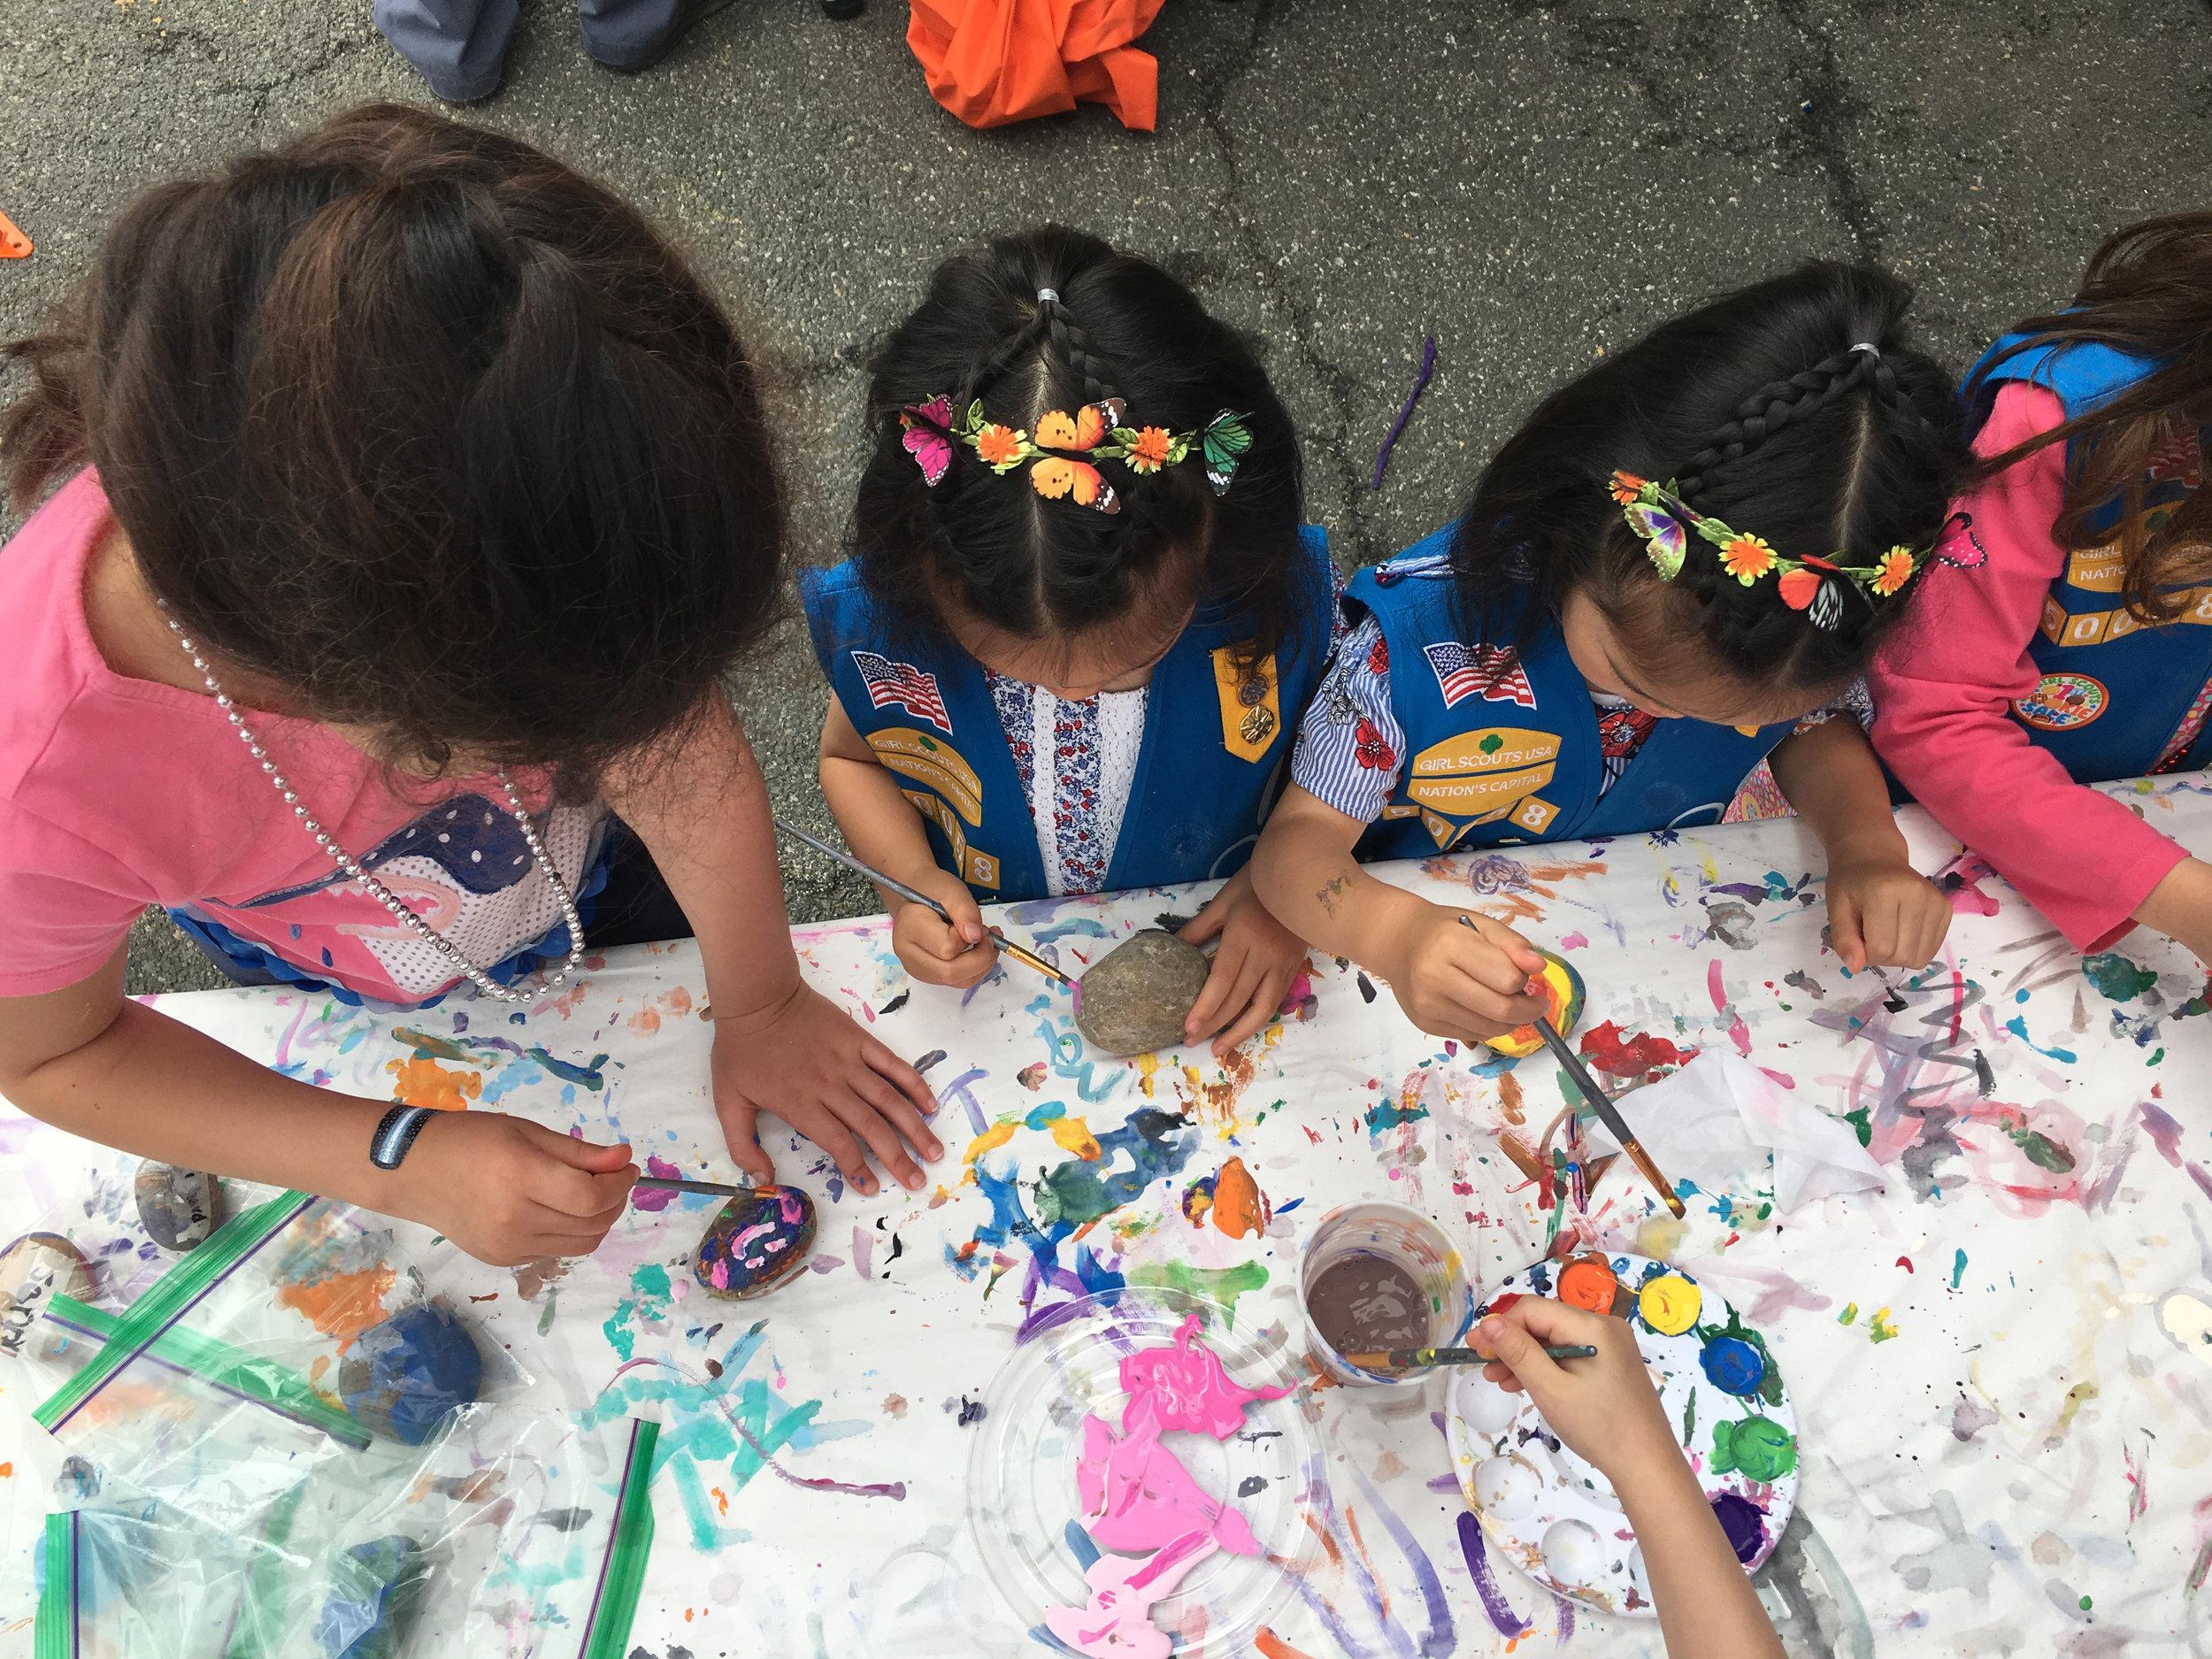 Week of July 22 - Clay Art, Chess, Decorating Cupcakes, Magic Camp